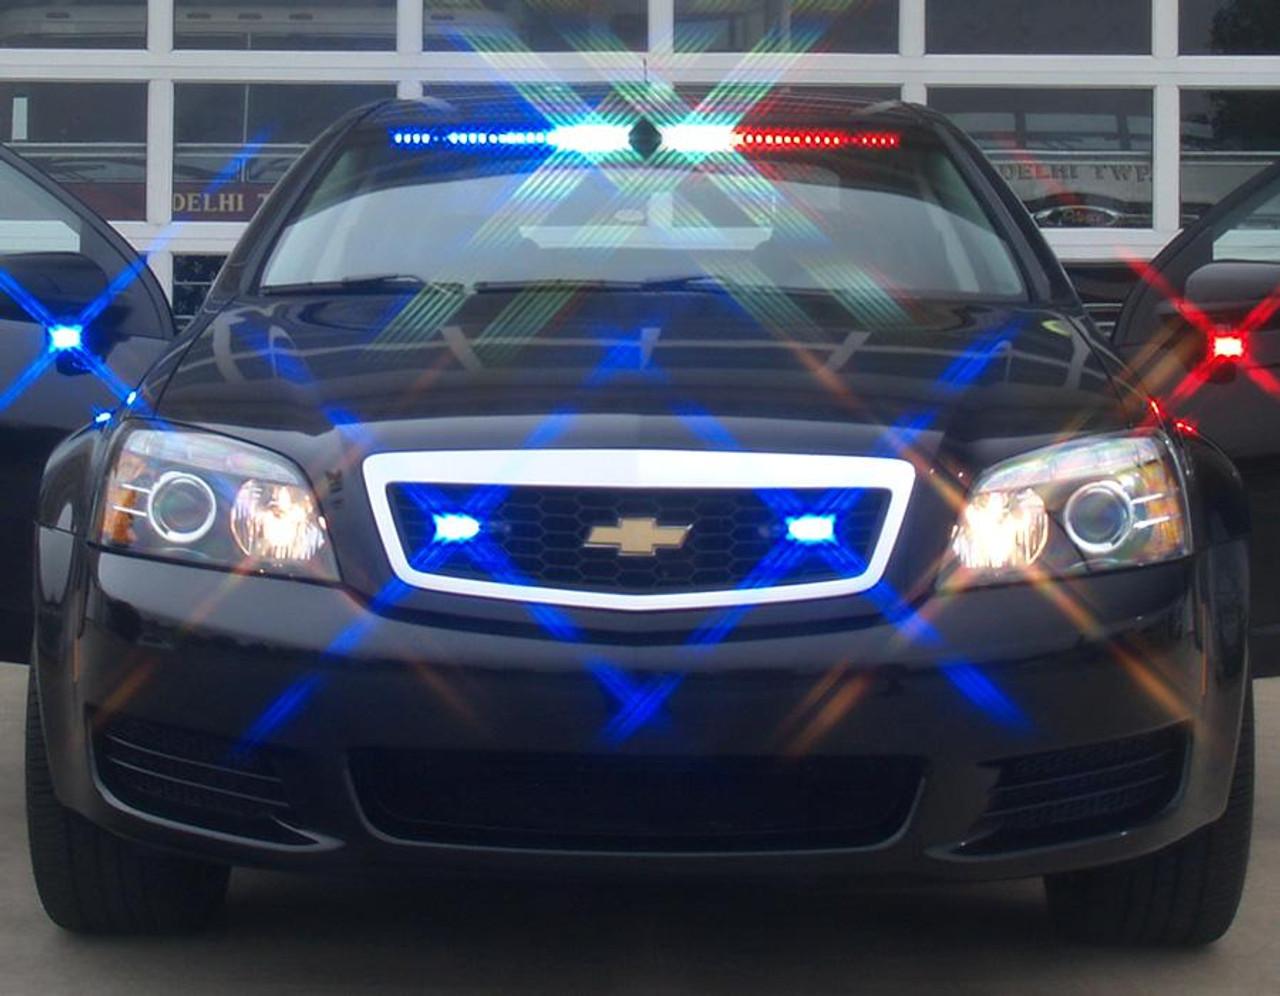 Sound Off Chevy Silverado N Force Interior Front Facing Led Light Bar Single Color Or Dual Color Per Lighthead Enfwbf